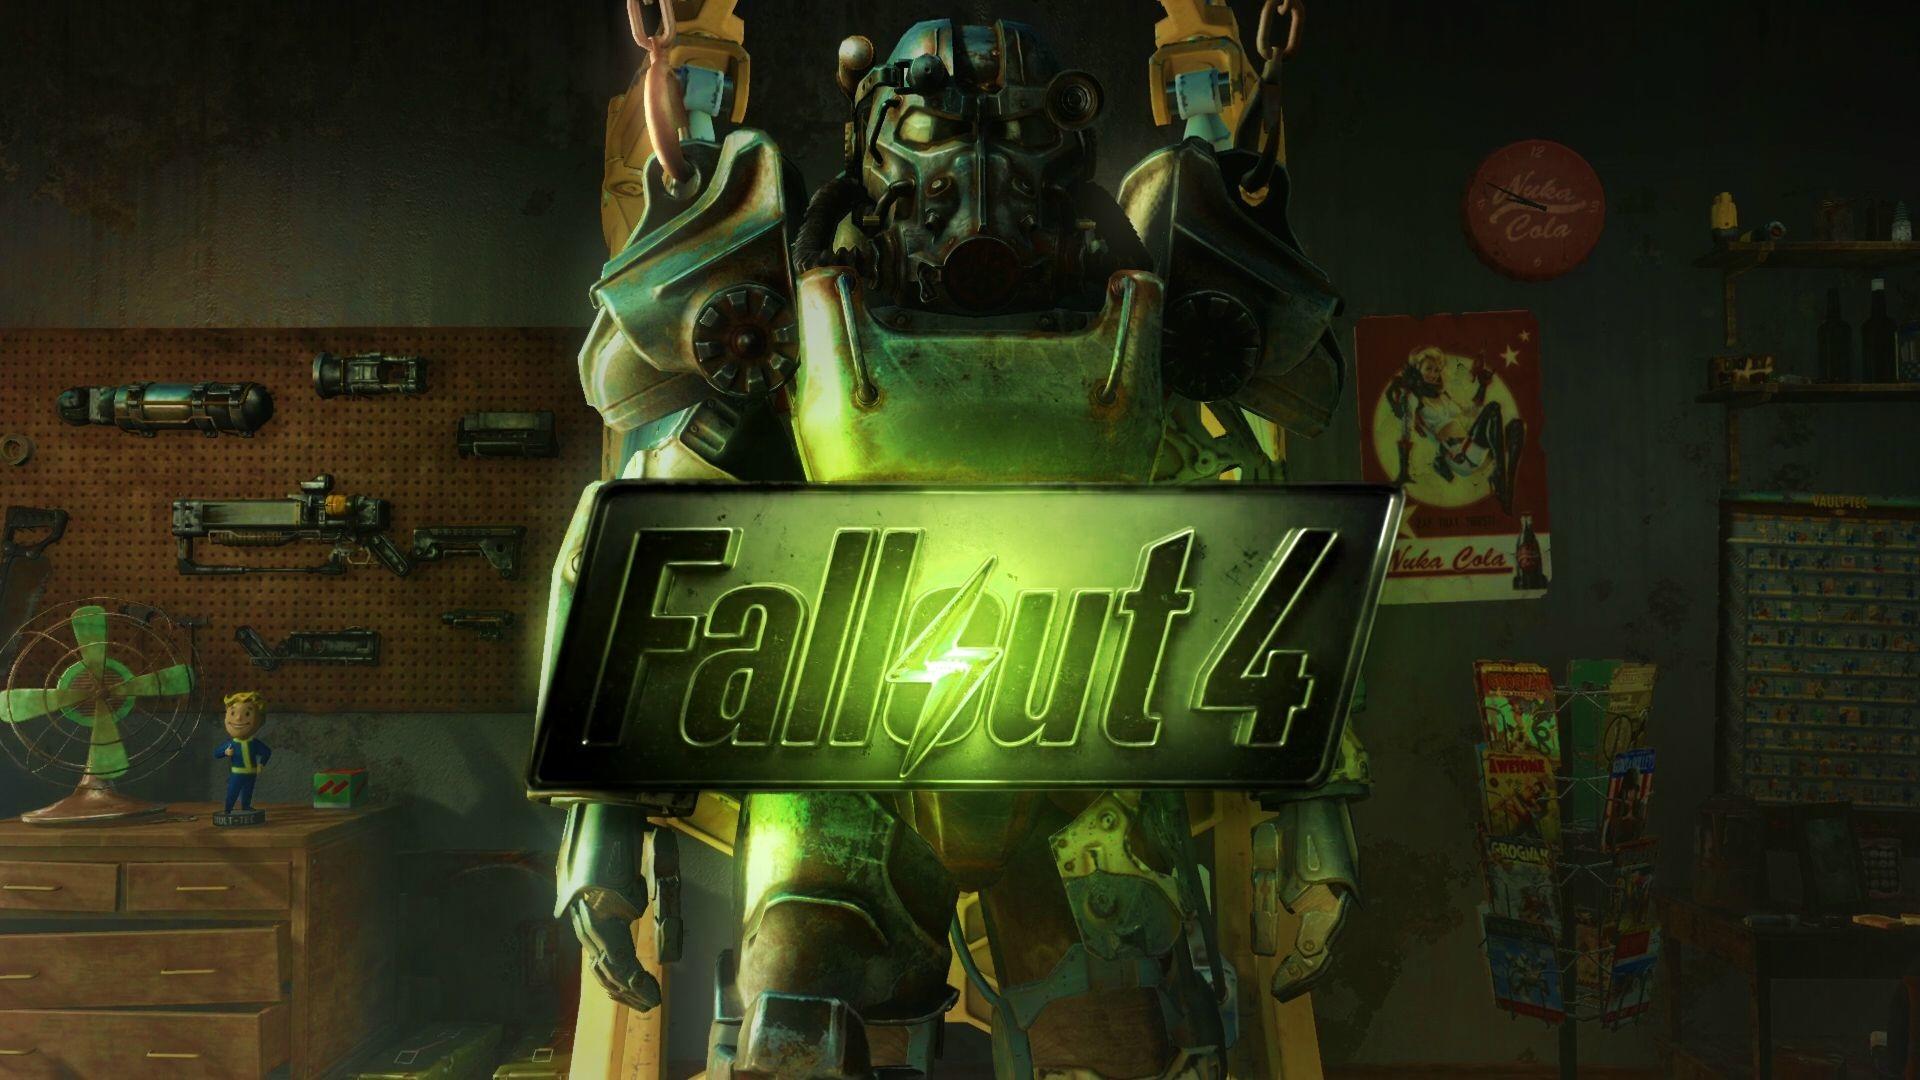 Fallout 4 Ps4 Wallpaper Fallout 4 Video Game Wallpaper